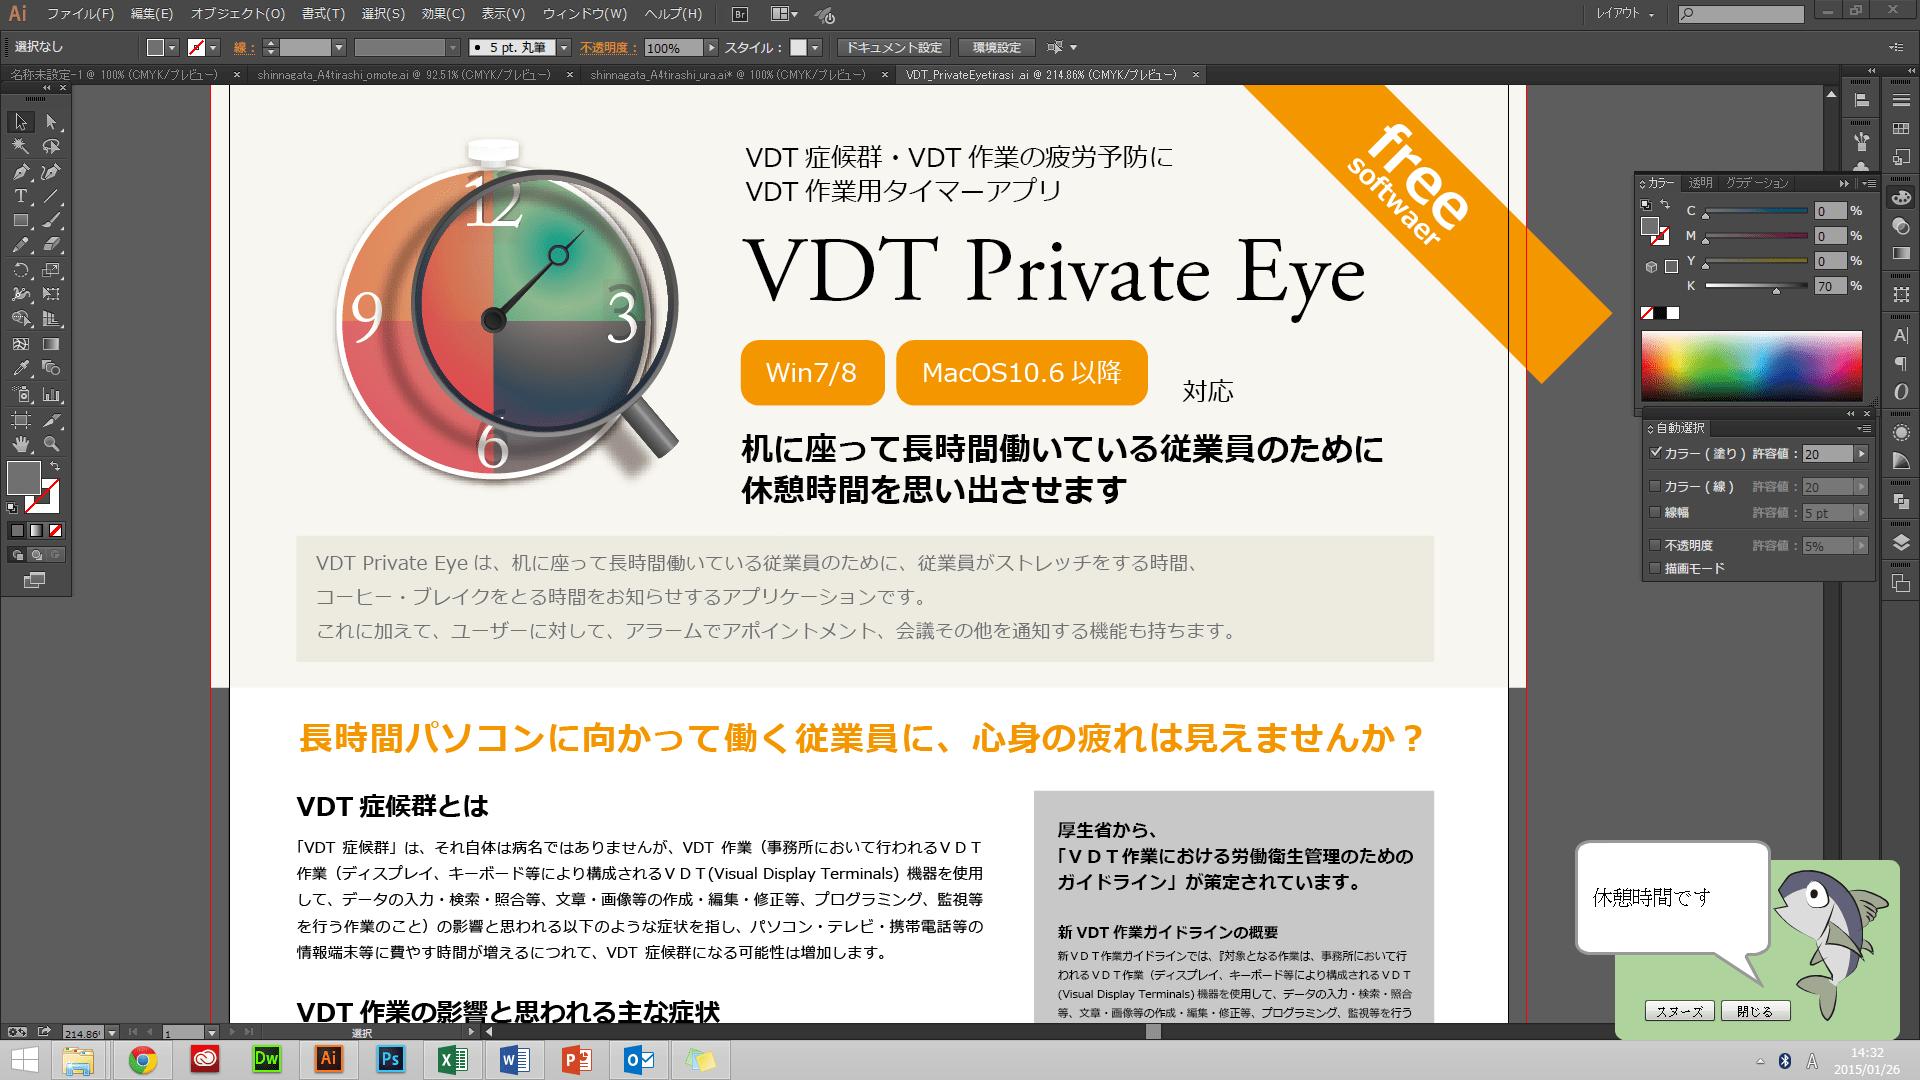 VDT Private Eye